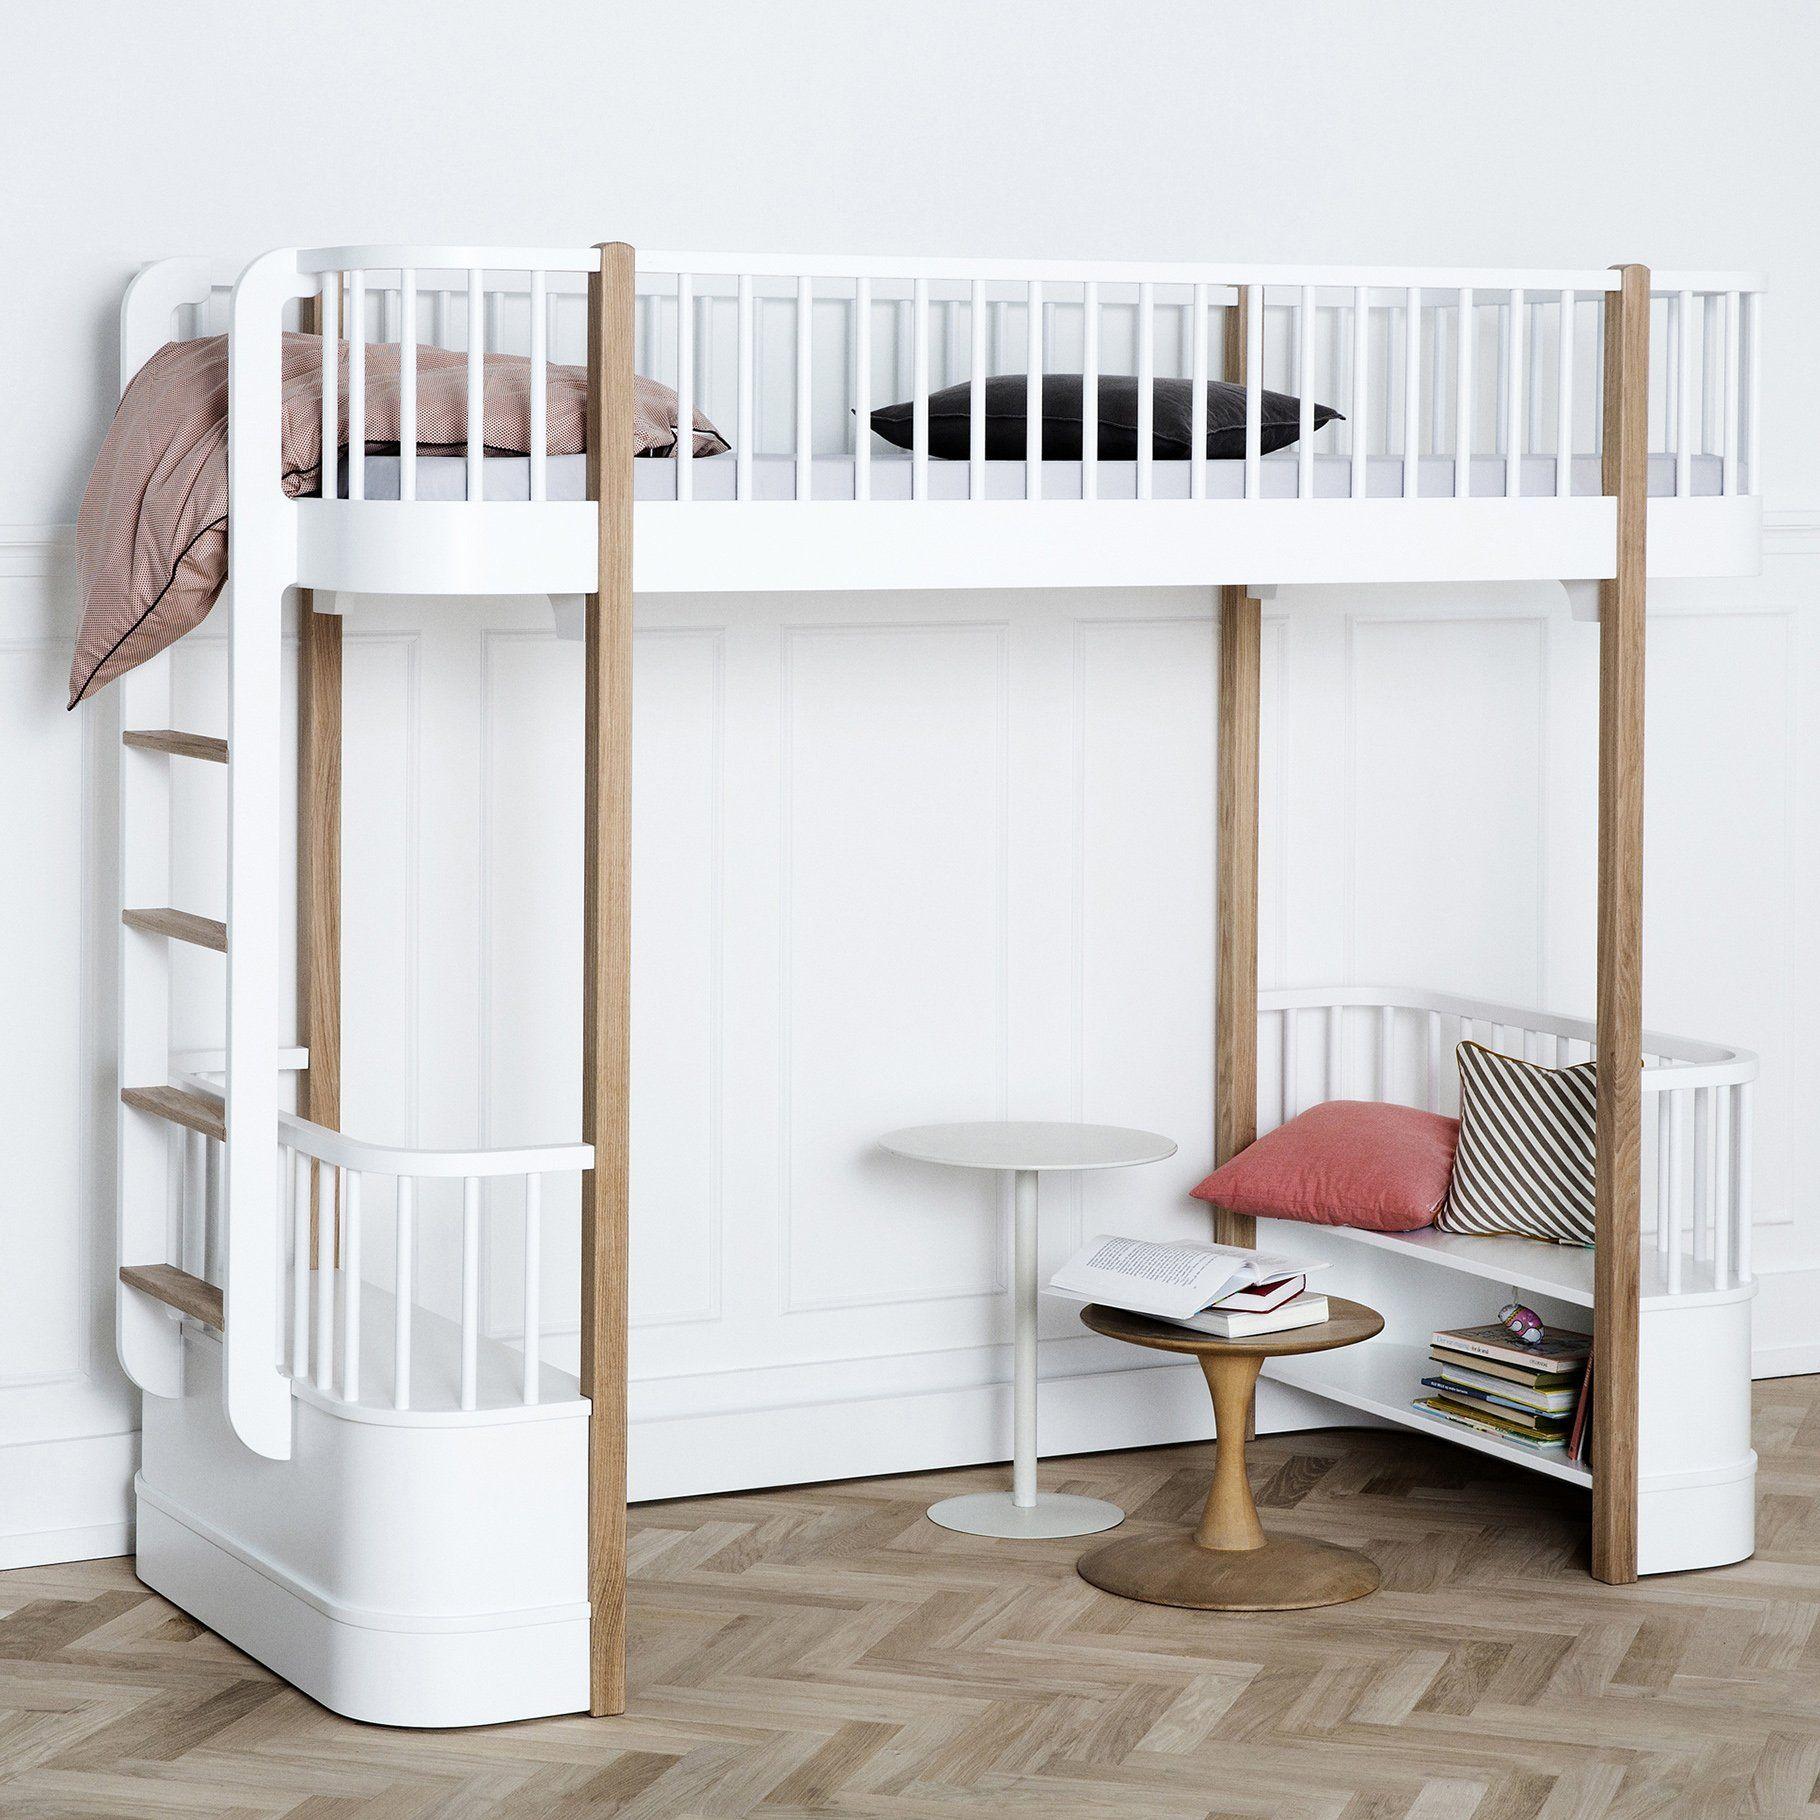 High loft bed  Deco  Pinterest  Lofts and Bedrooms